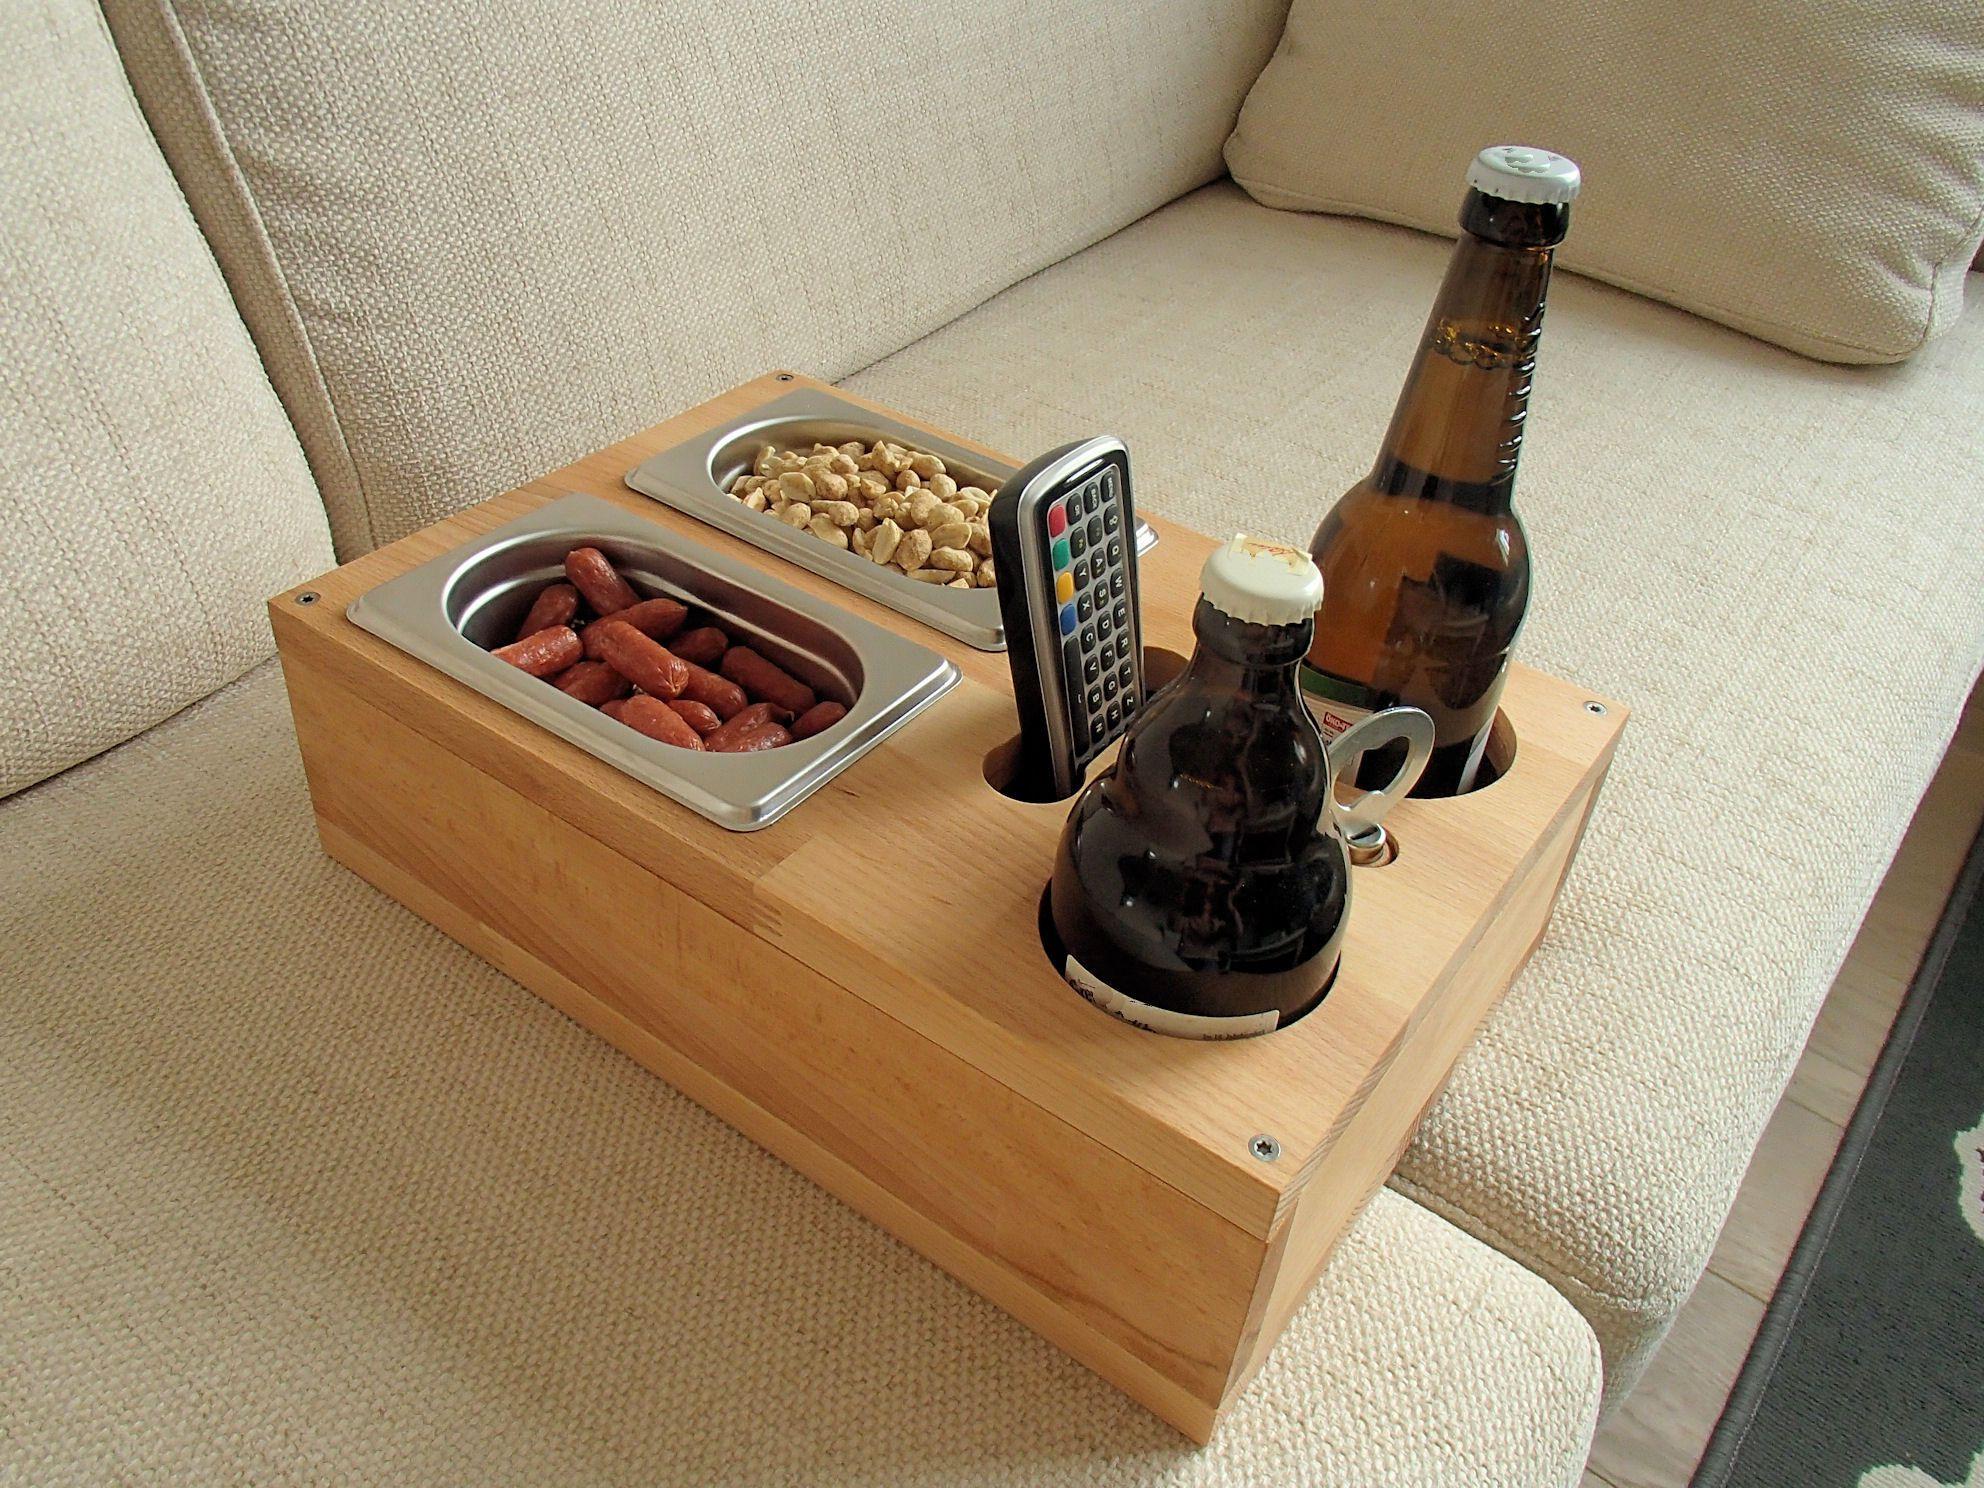 Das perfekte Männergeschenk! Sofatablett - Bier-Kiste ...